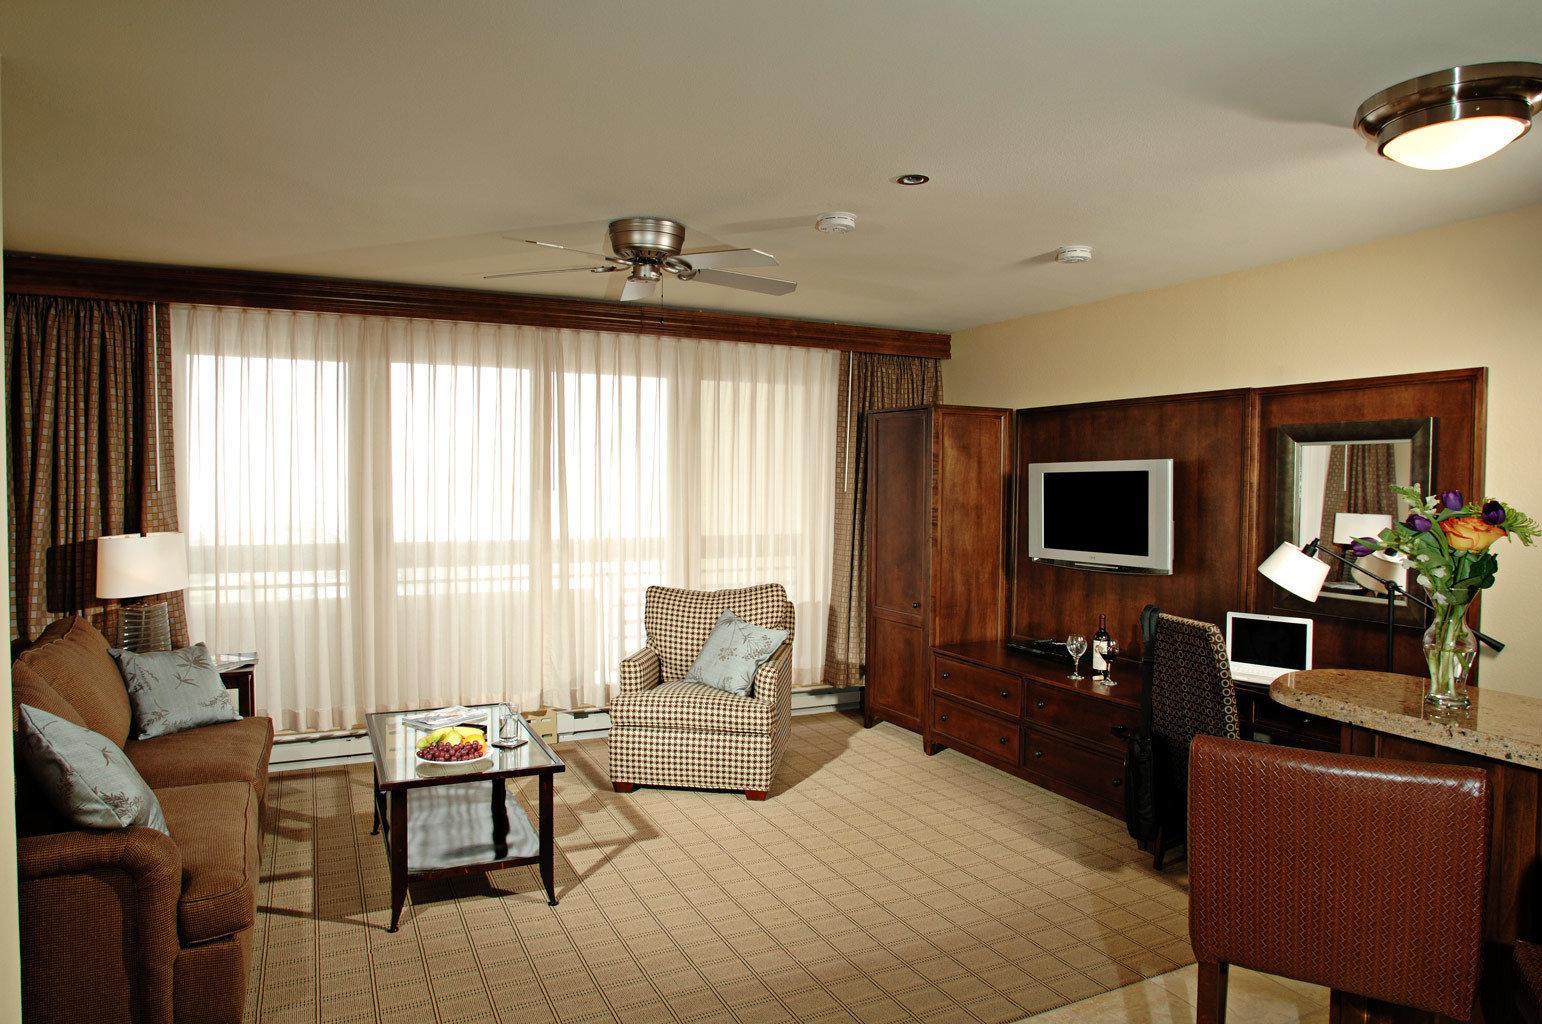 Modern Suite property living room home condominium Bedroom cottage